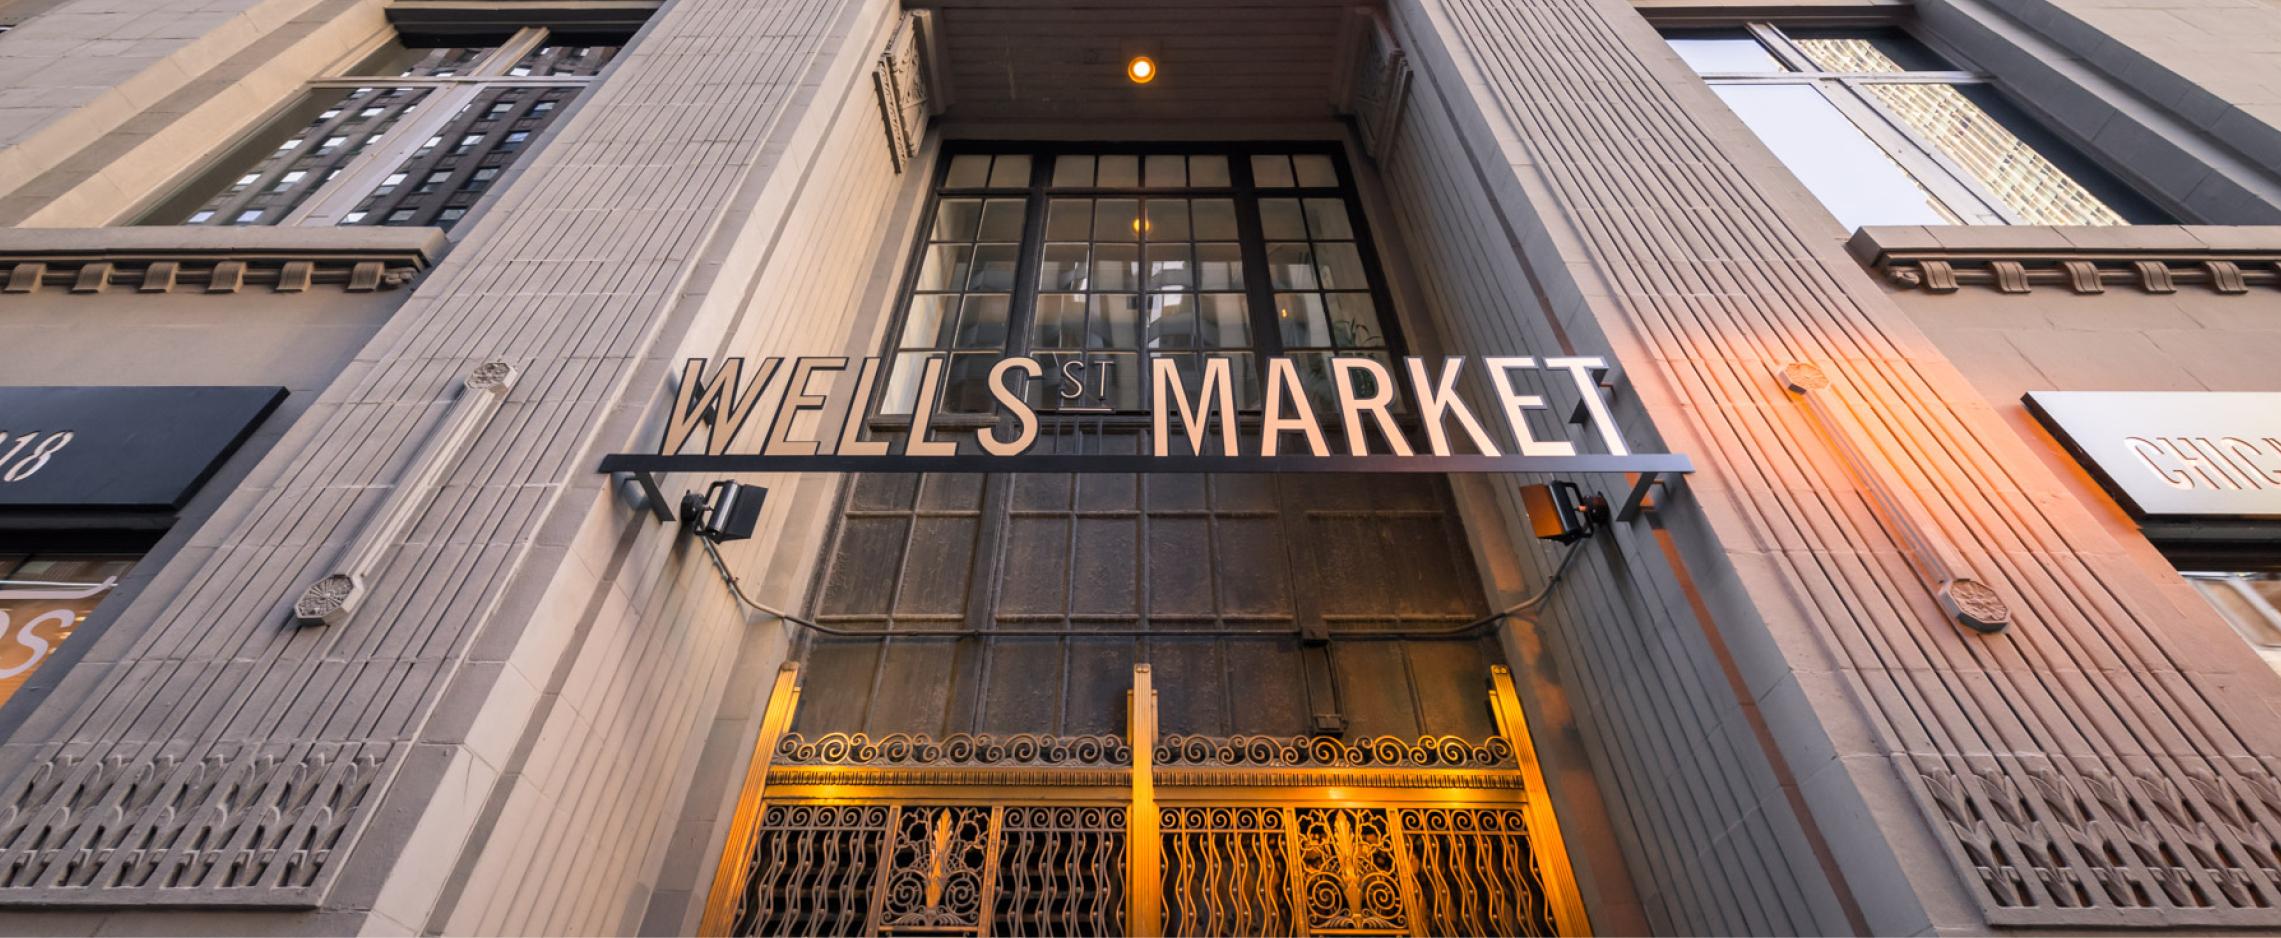 Lake & Wells Street Market